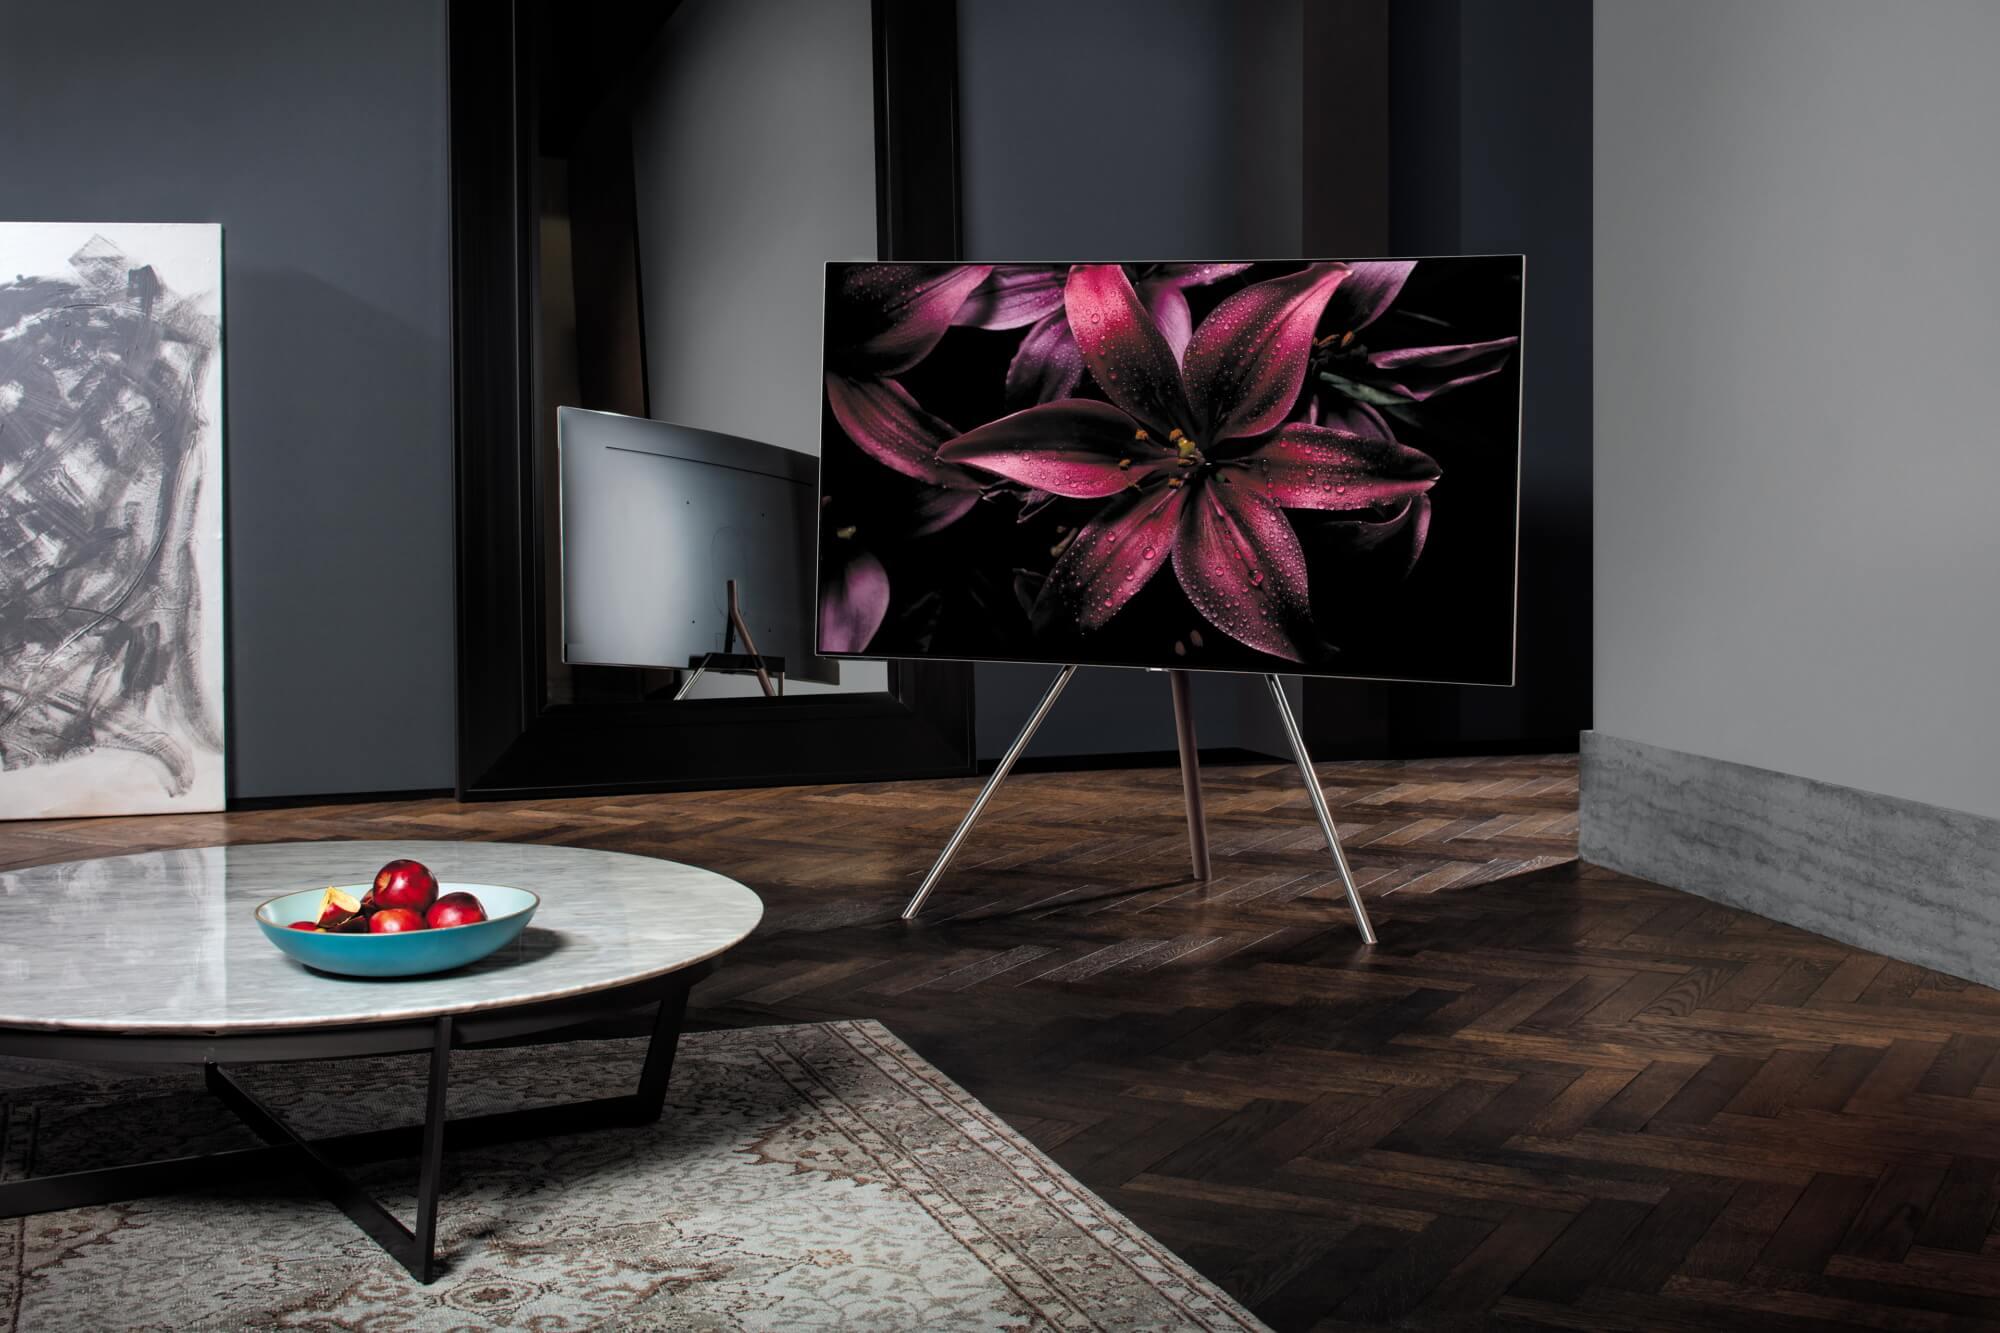 Samsung 2017 QLED TV